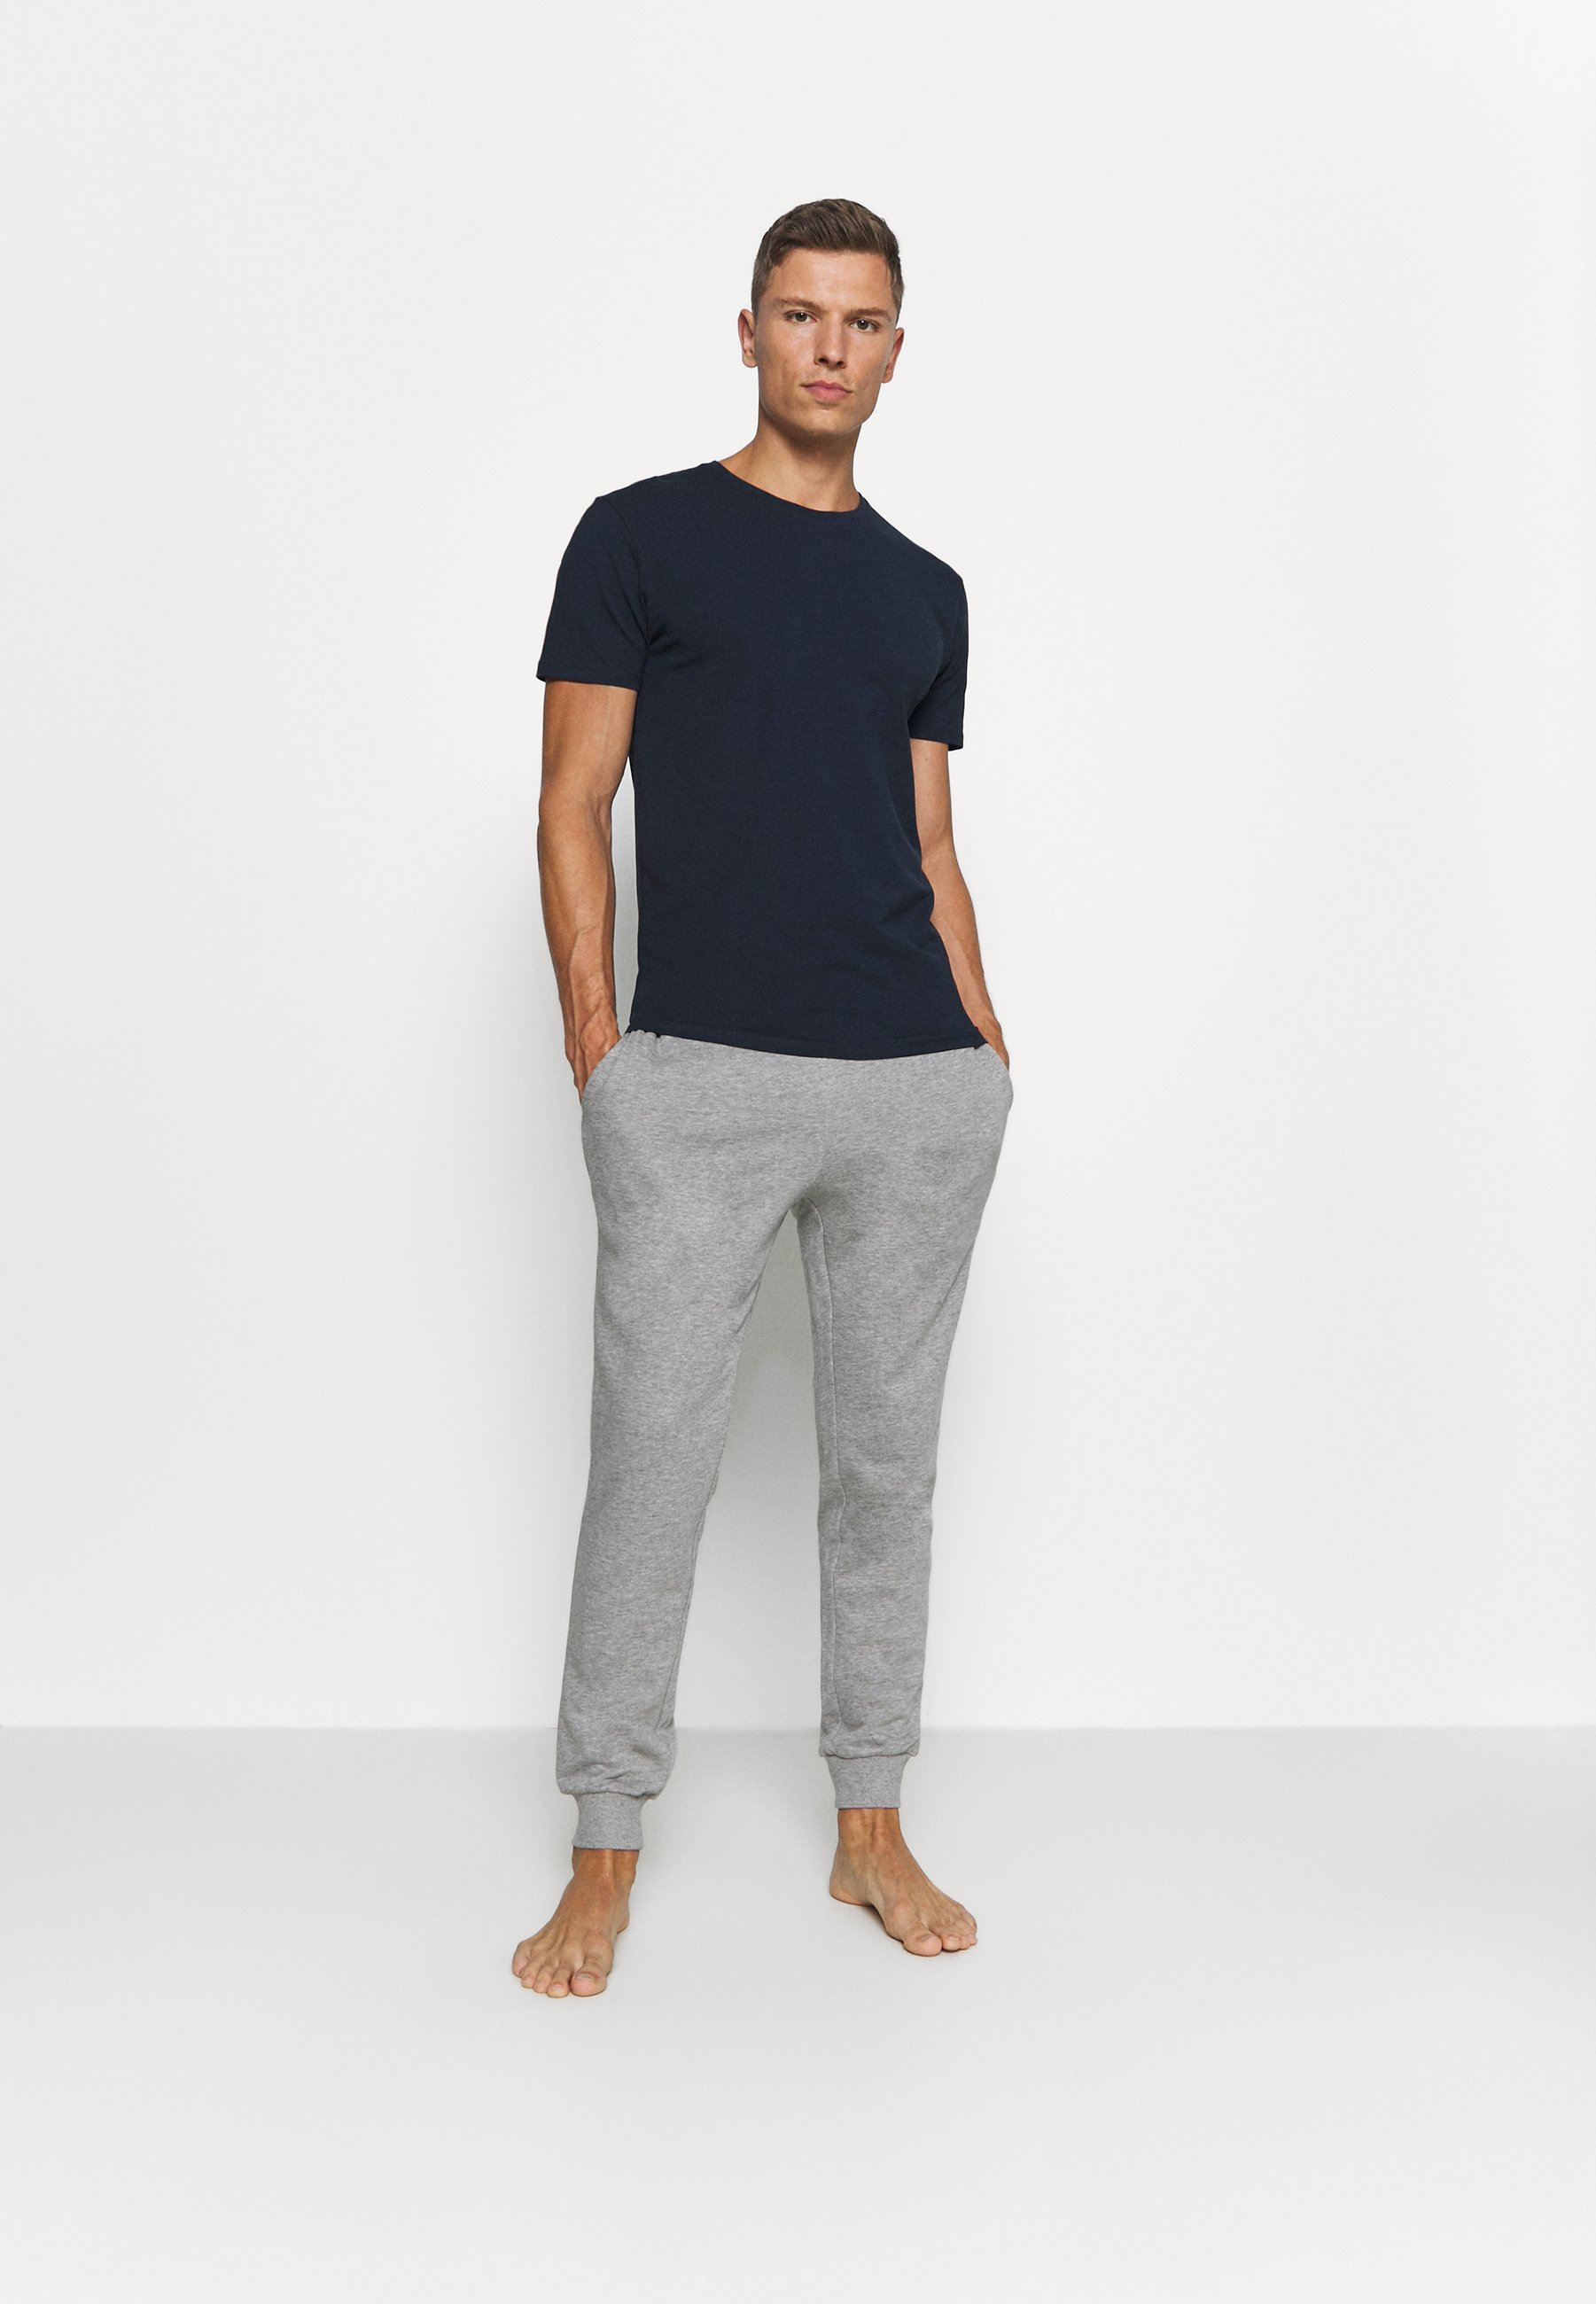 Men SLHNEWPIMA O NECK TEE 3 PACK  - Basic T-shirt